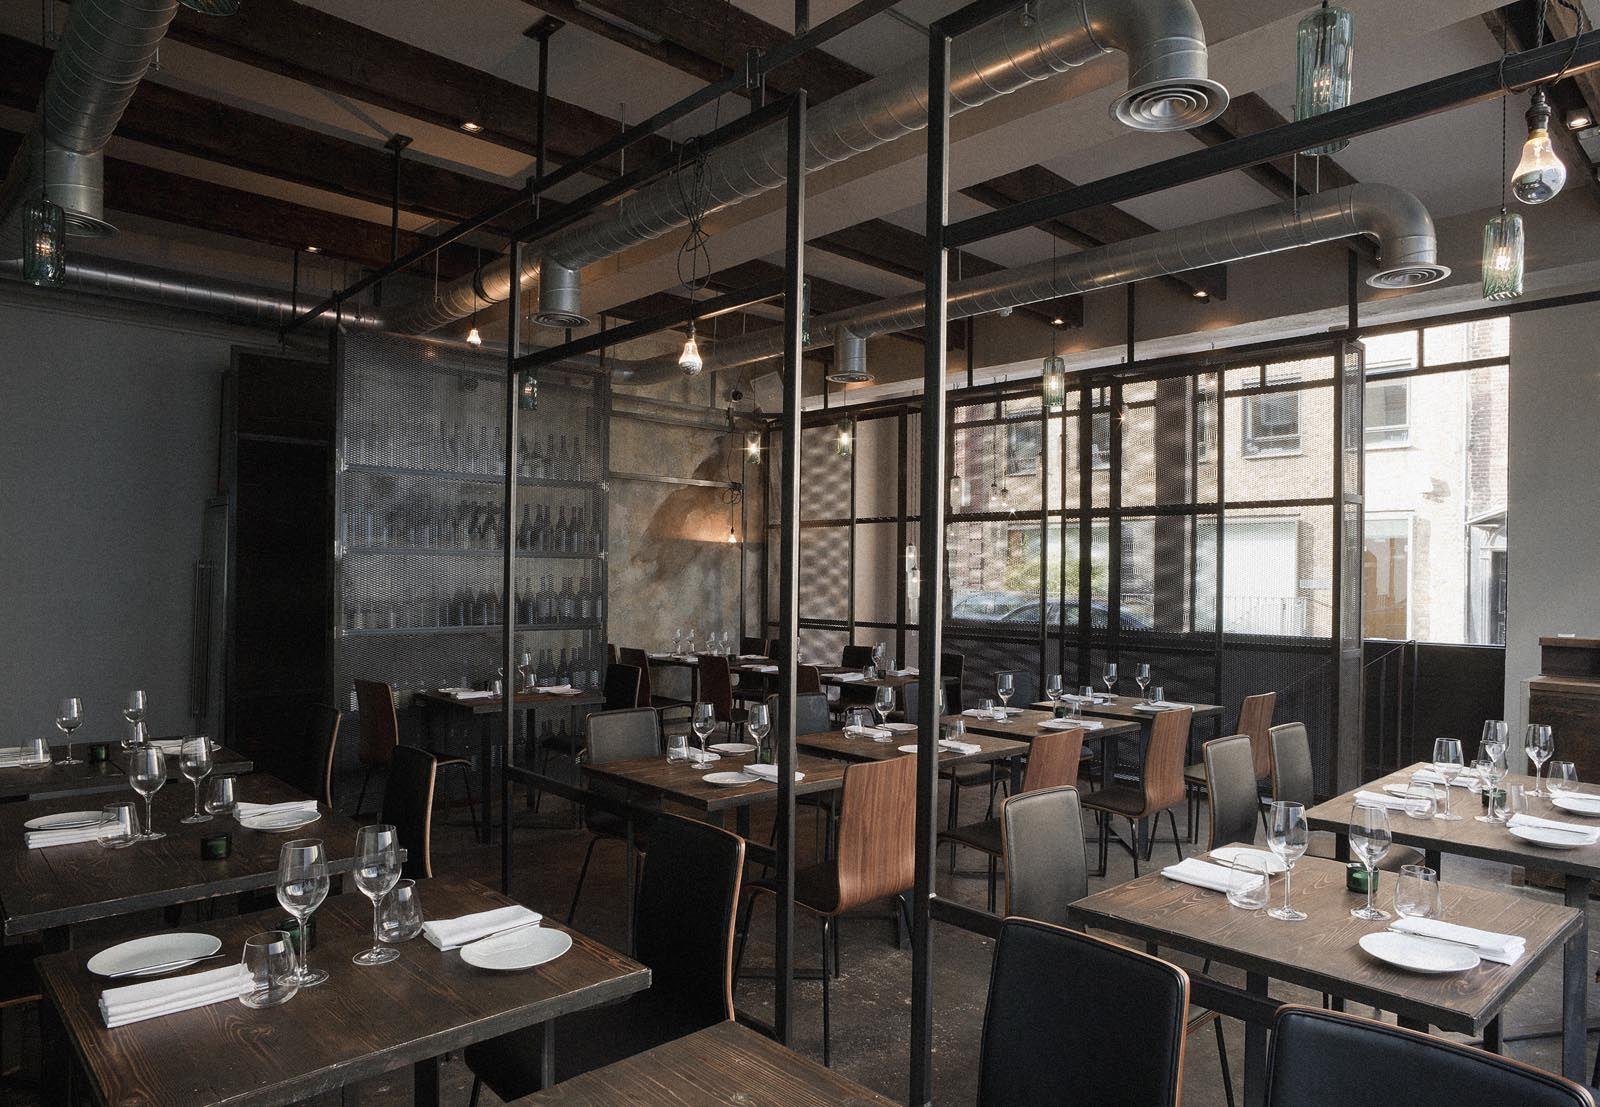 Beautiful Industrial Interior Design With Restaurant